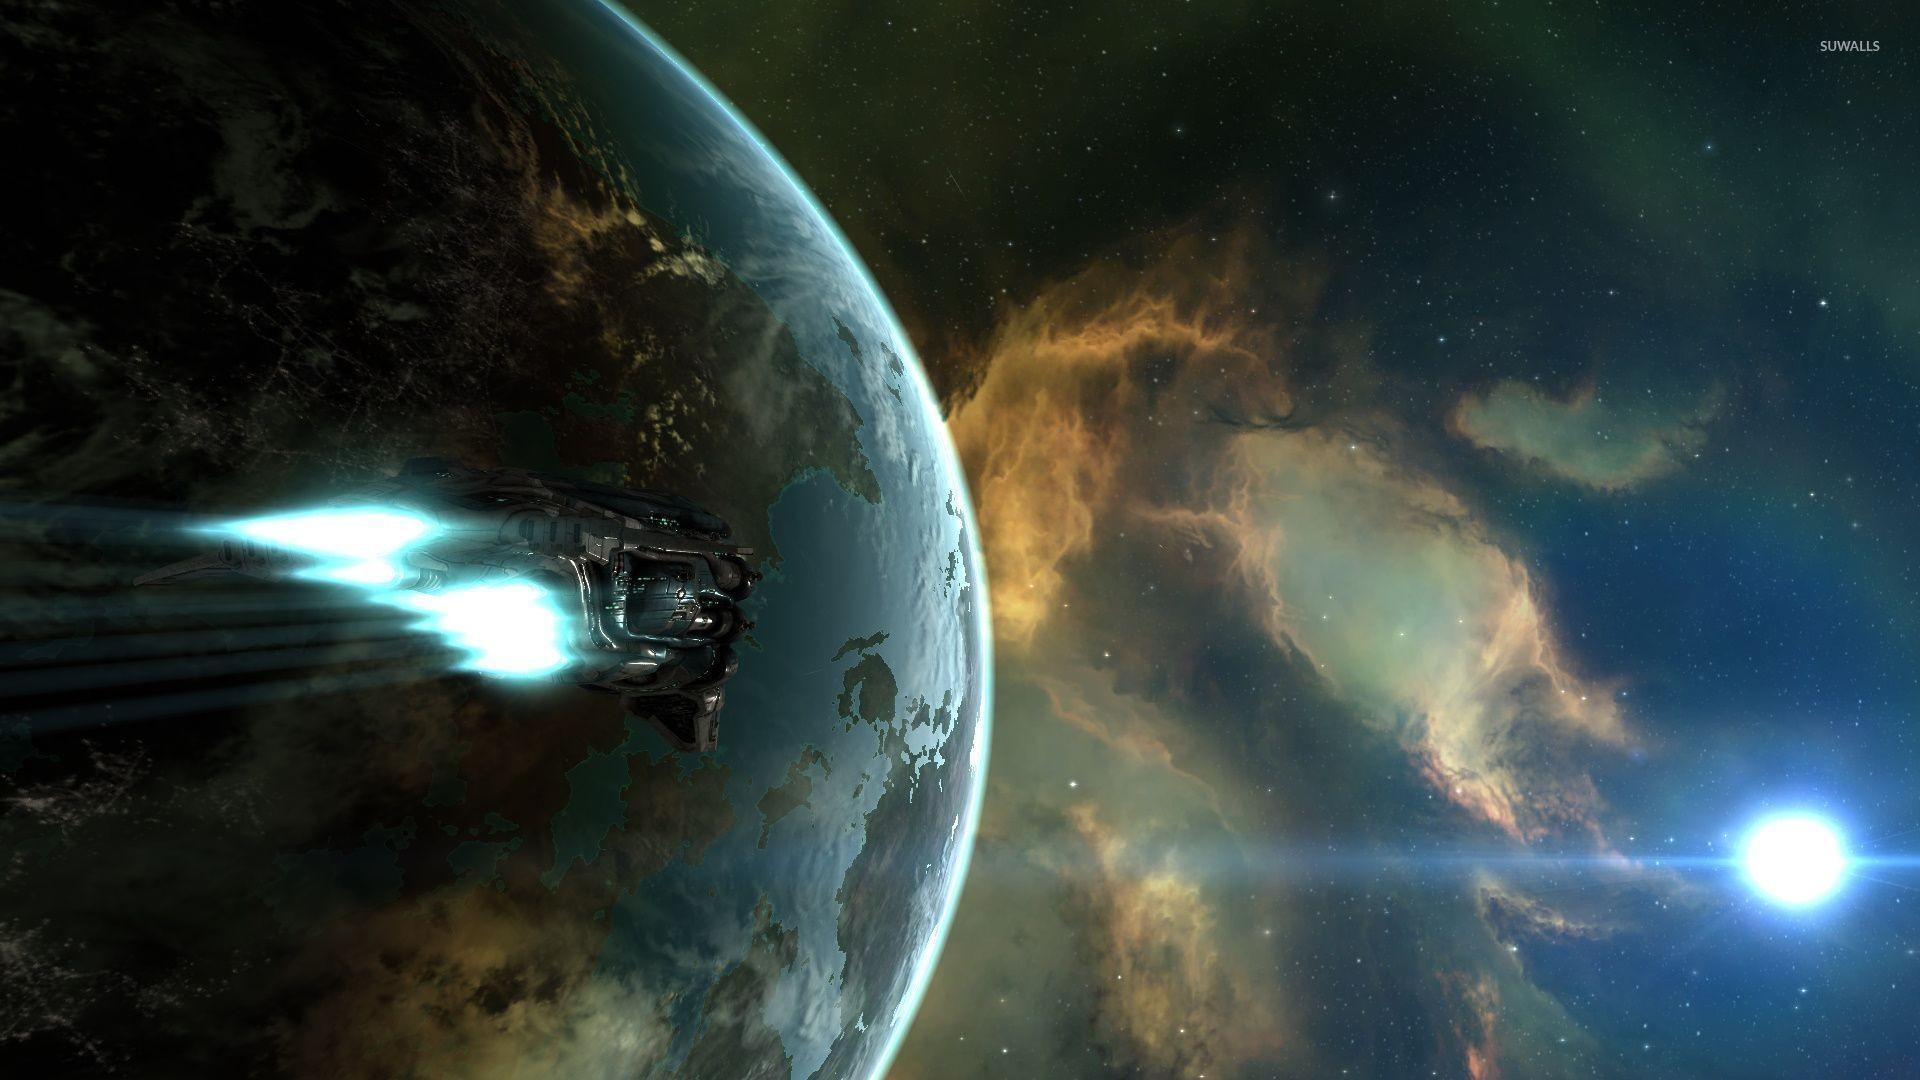 Battlestar Galactica spaceship. 515. Spaceship flying to the nebula wallpaper  jpg